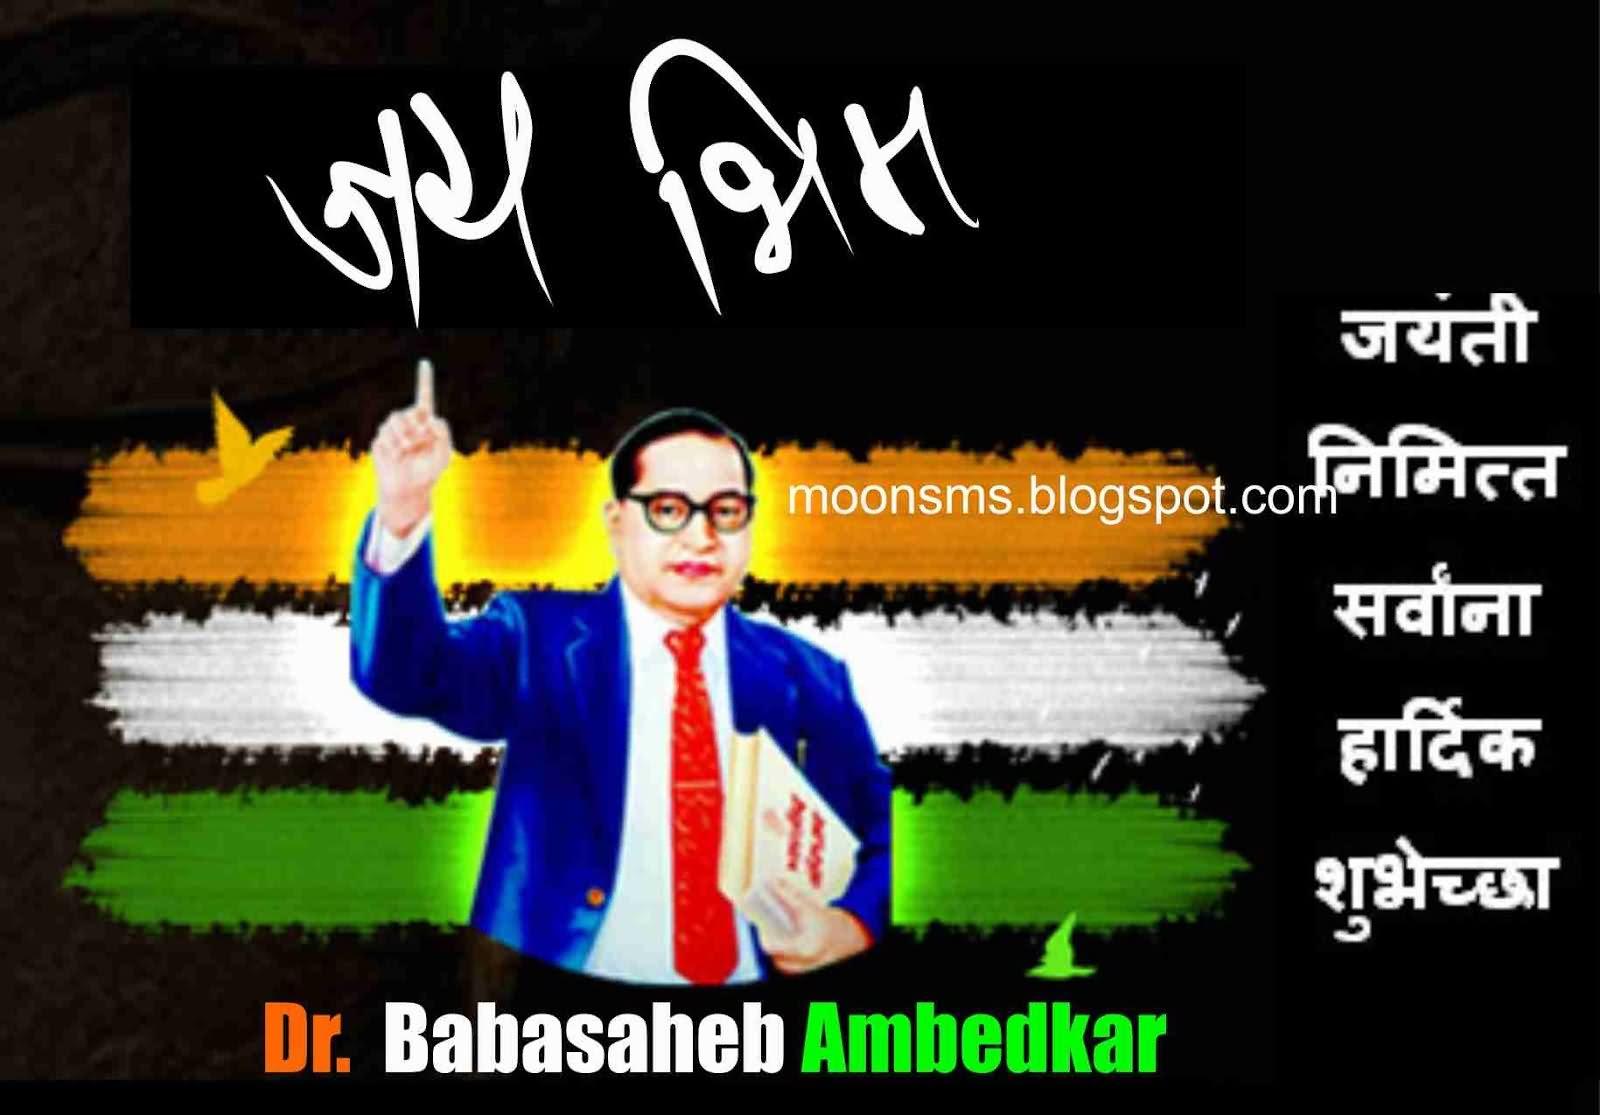 Ambedkar Jayanti Marathi sms wallpaper whatsapp status